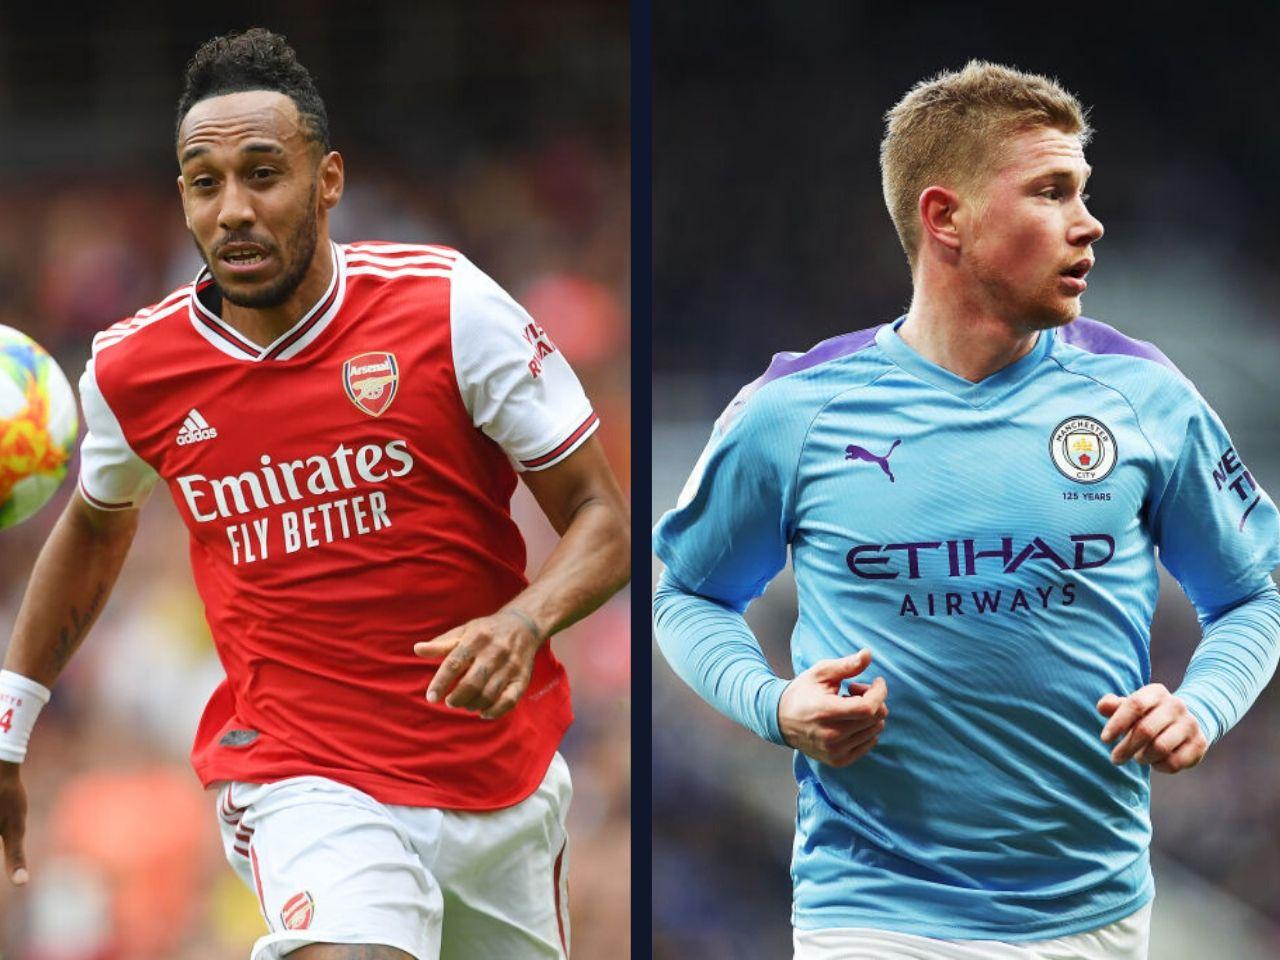 5 Fakta Unik Jelang Duel Arsenal Vs Man City Malam Ini